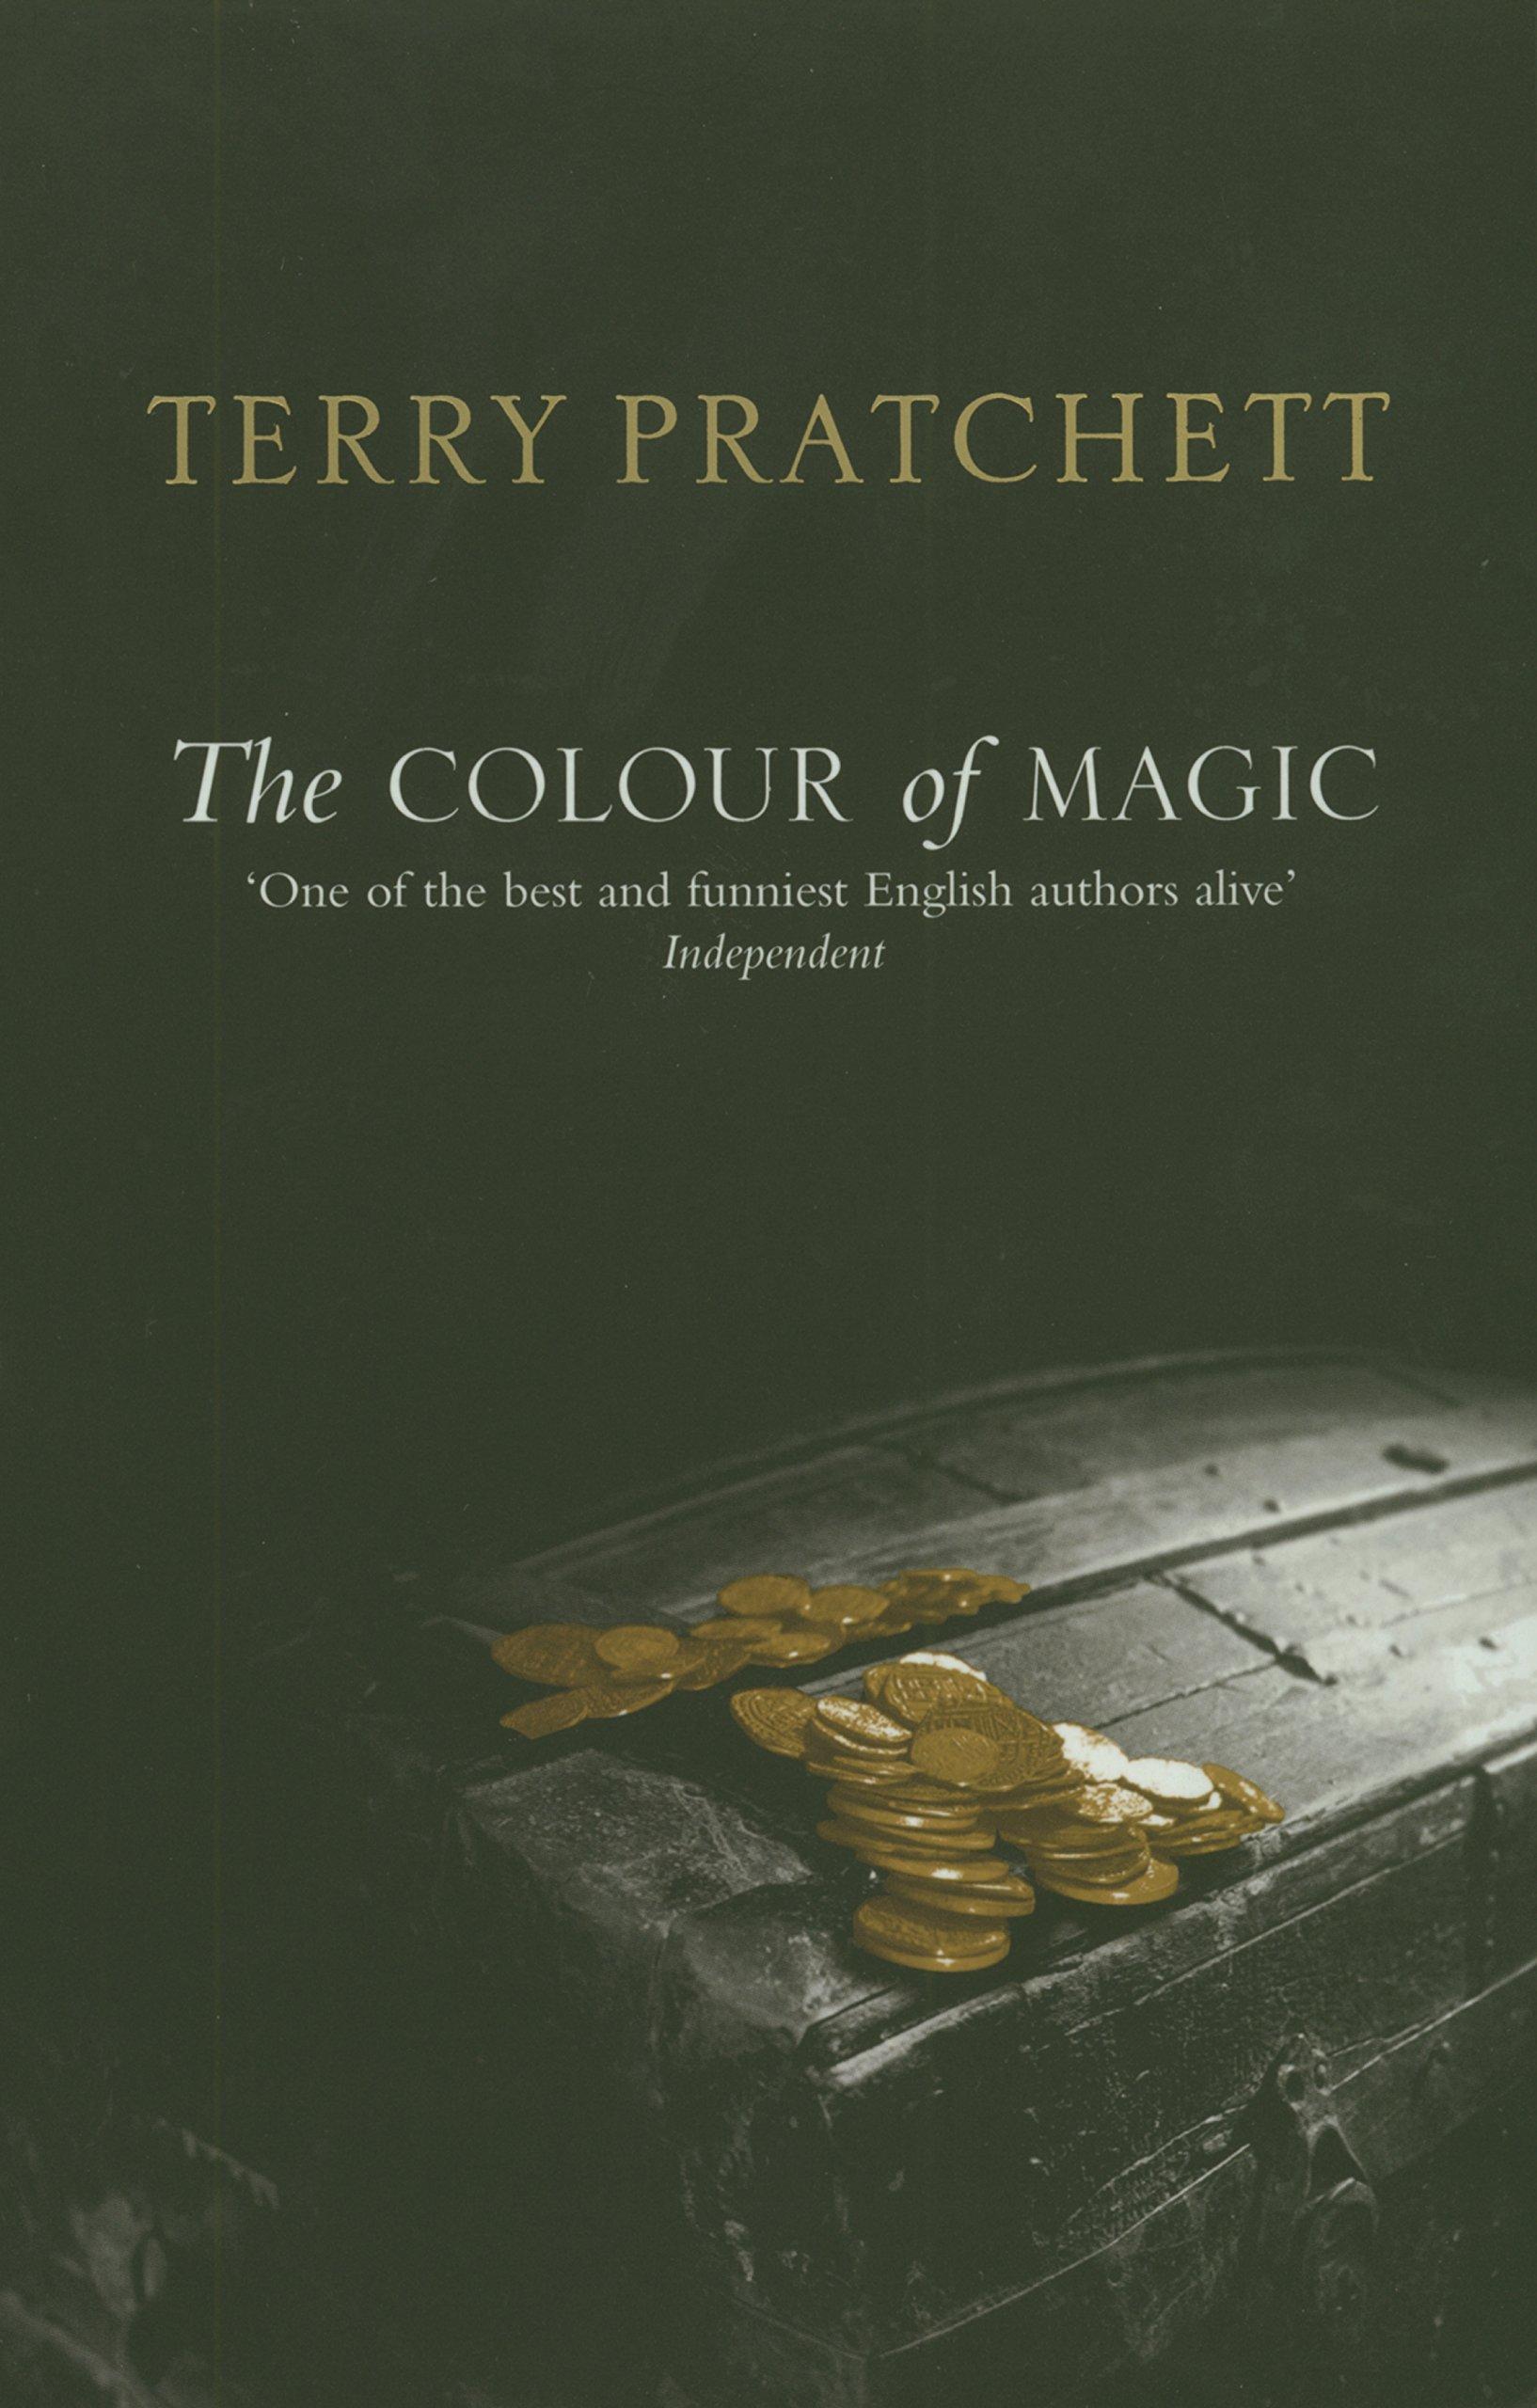 THE COLOUR OF MAGIC EPUB SOFTWARE PDF DOWNLOAD